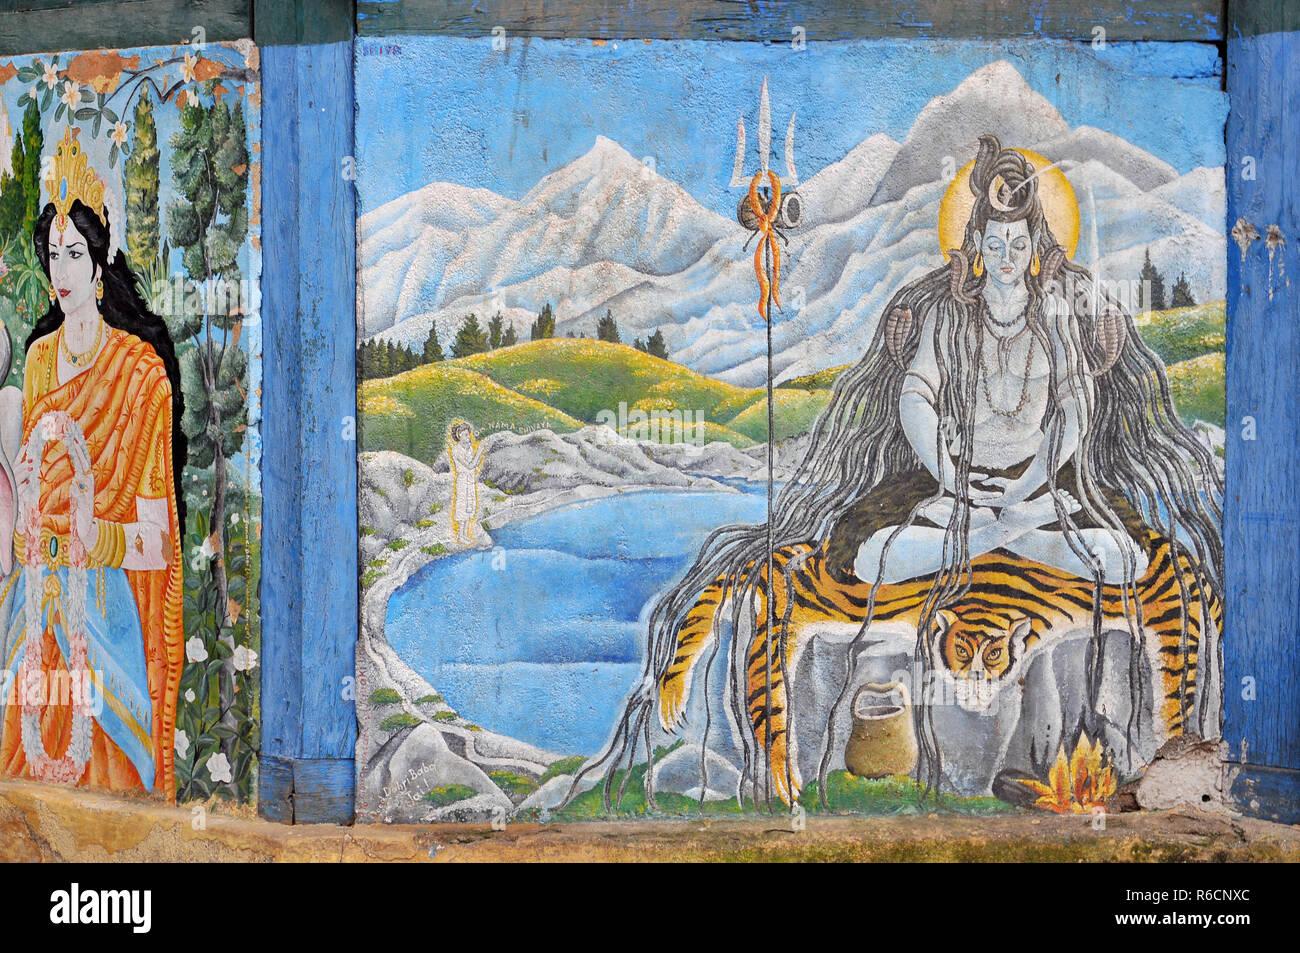 Nepal, Kathmandu, A Painting Of The Hindu God Shiva Meditating In The Himalayas Adorns The Walls Of A Temple At Kathmandu'S Pashupatinath - Stock Image